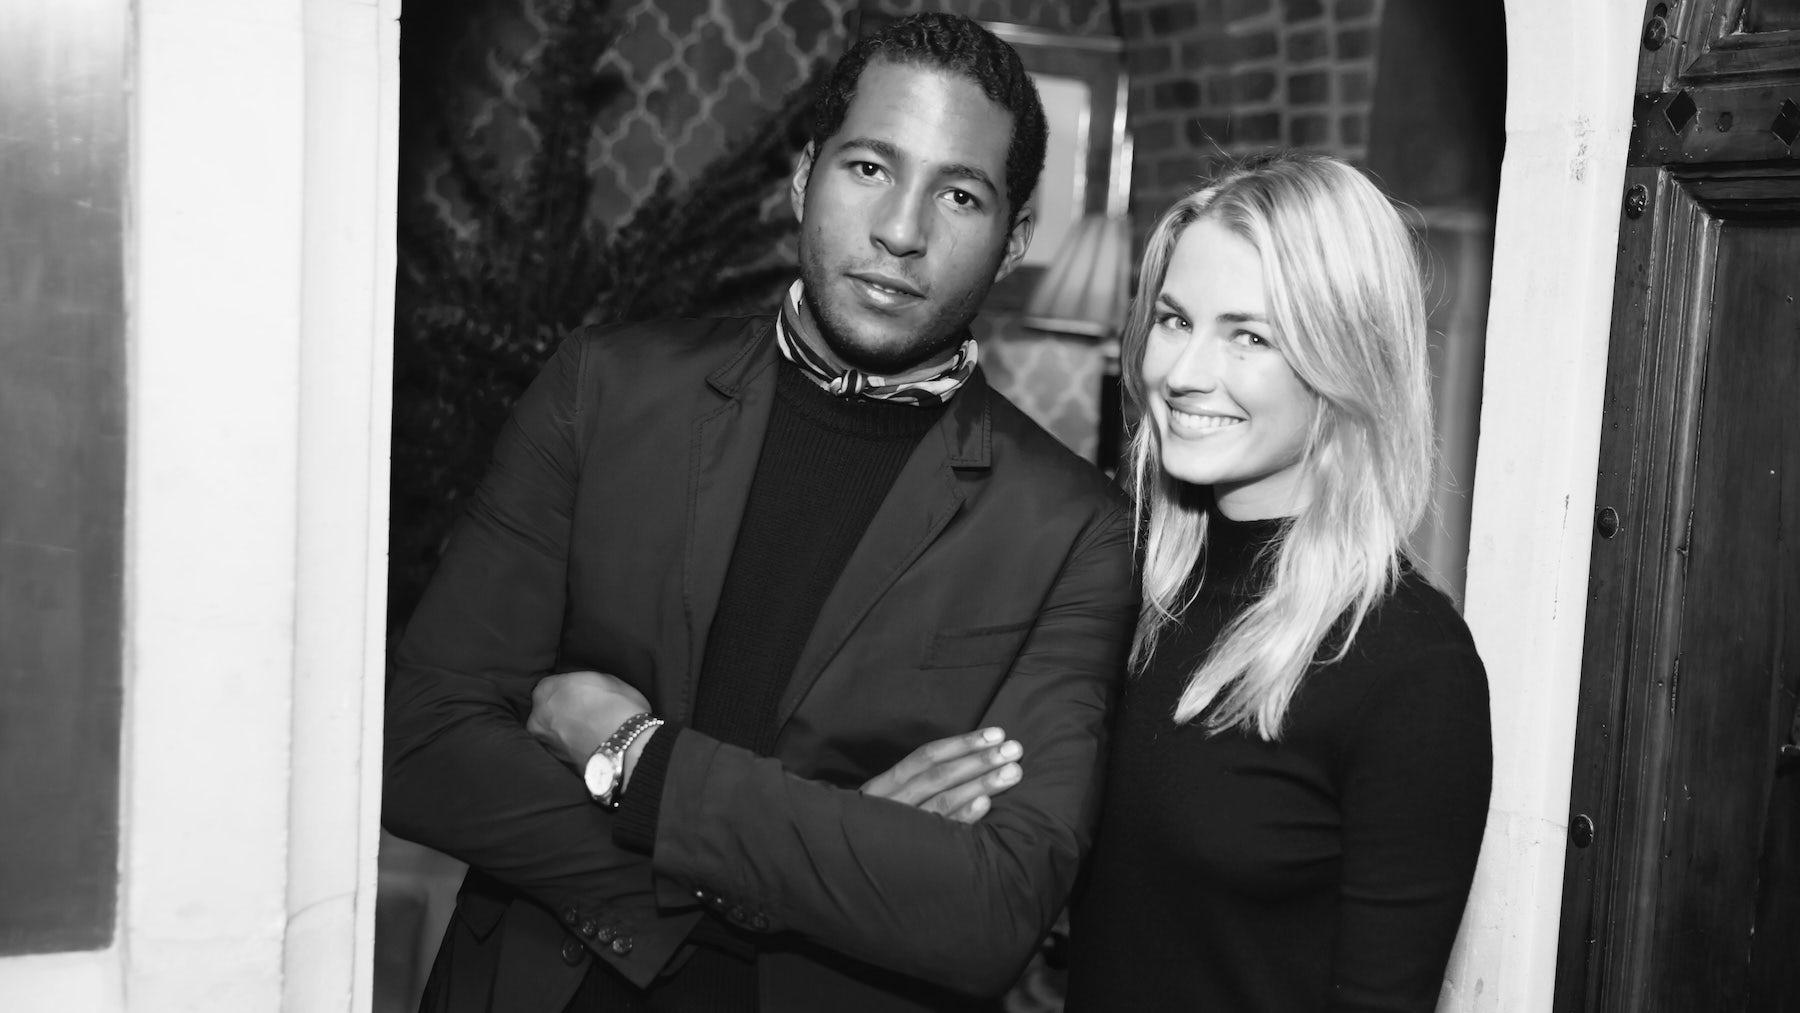 Hassan Pierre and Amanda Hearst, co-founders of Maison-de-mode.com   Source: Courtesy